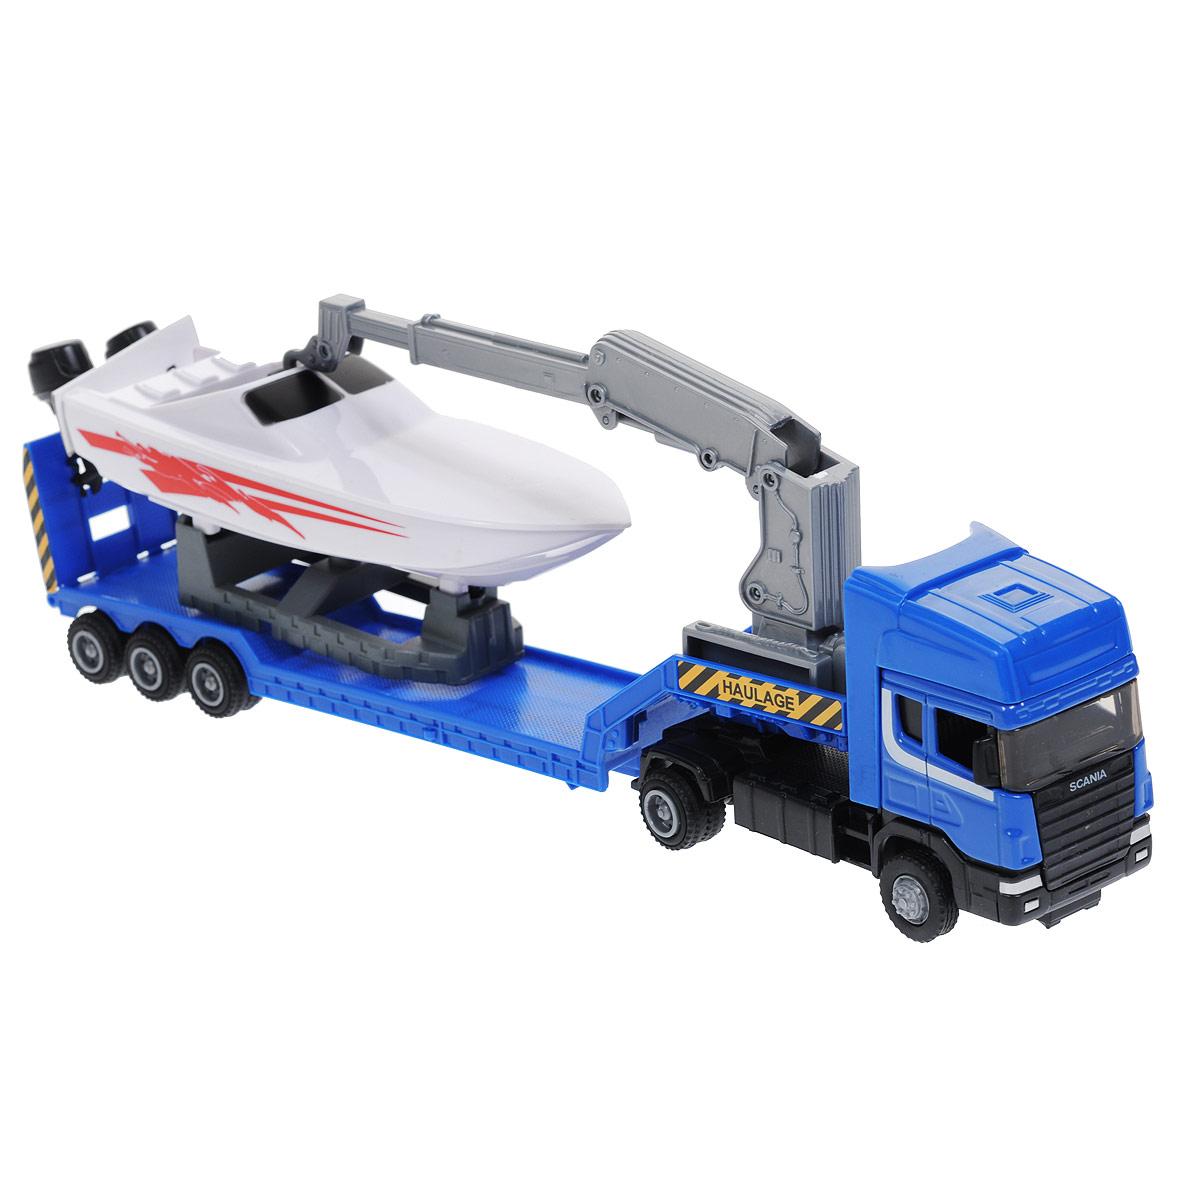 Autotime Игрушка Машинка Scania: Haulage, c катером, цвет: синий, белый. Масштаб 1/48 модель машины chun base 1 43 scania